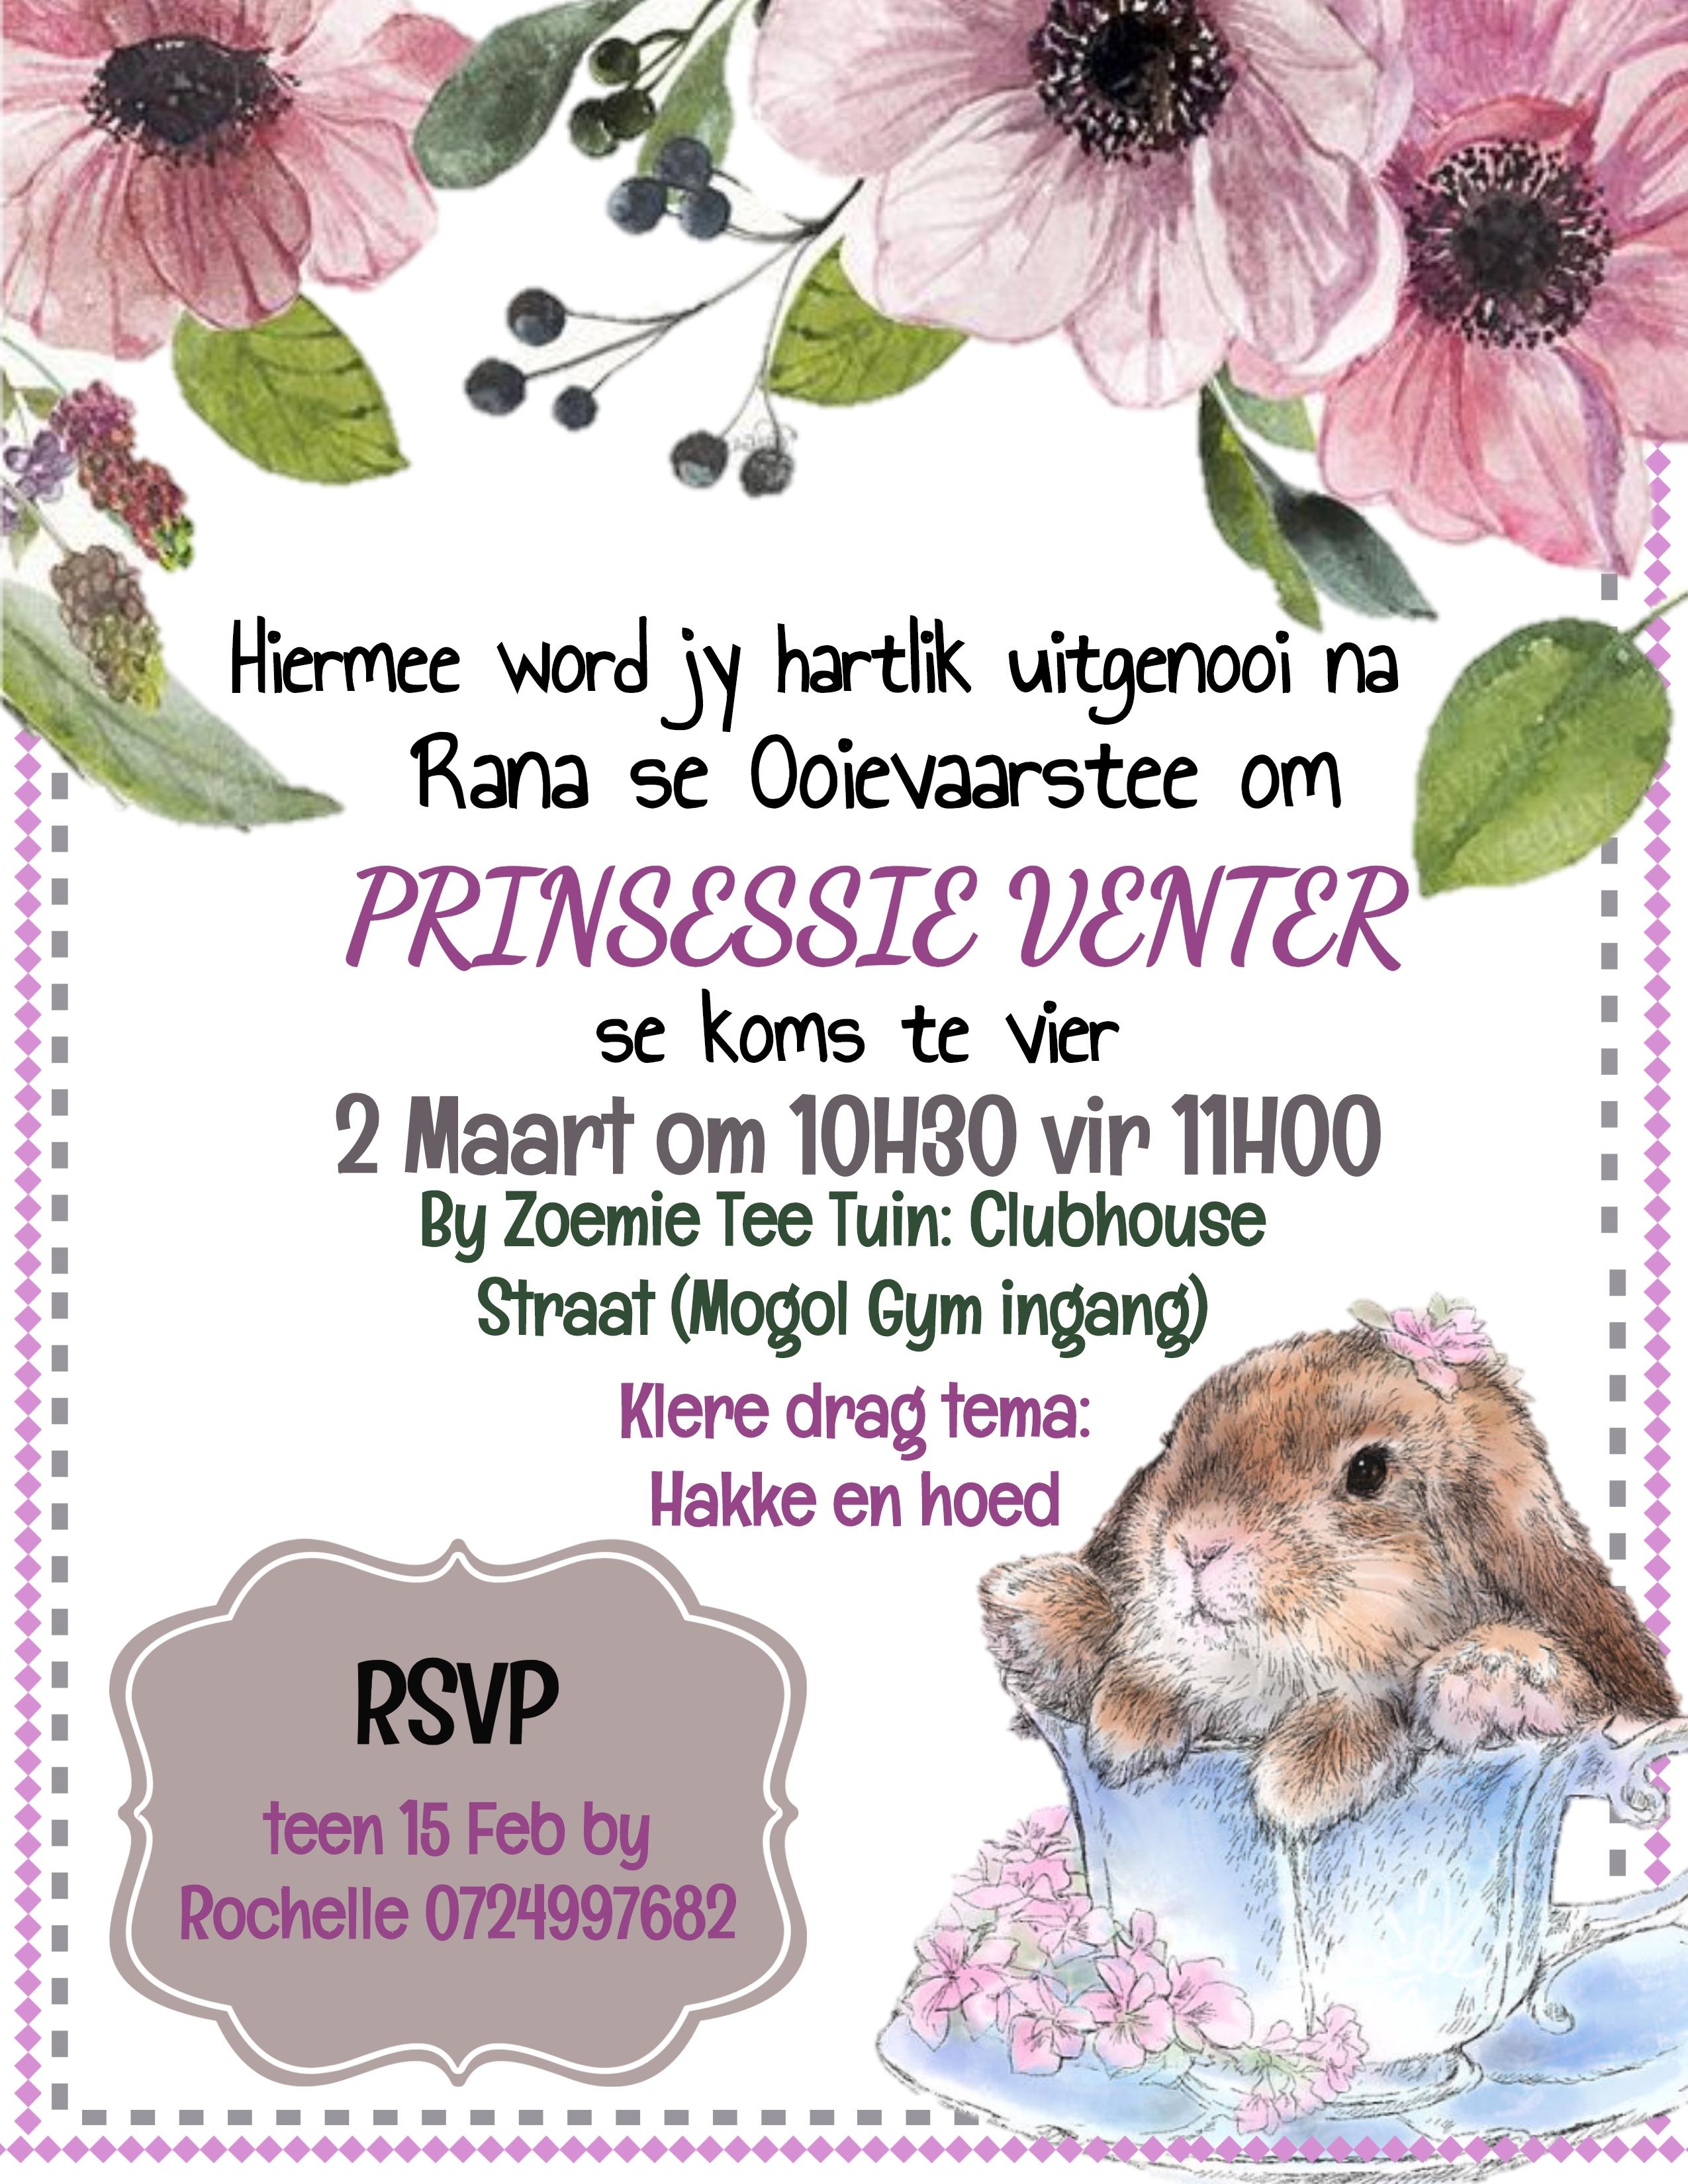 Custom Baby Shower Invitations- Owl Theme   Baby shower invitations owl  theme, Owl baby shower invitations, Owl baby shower